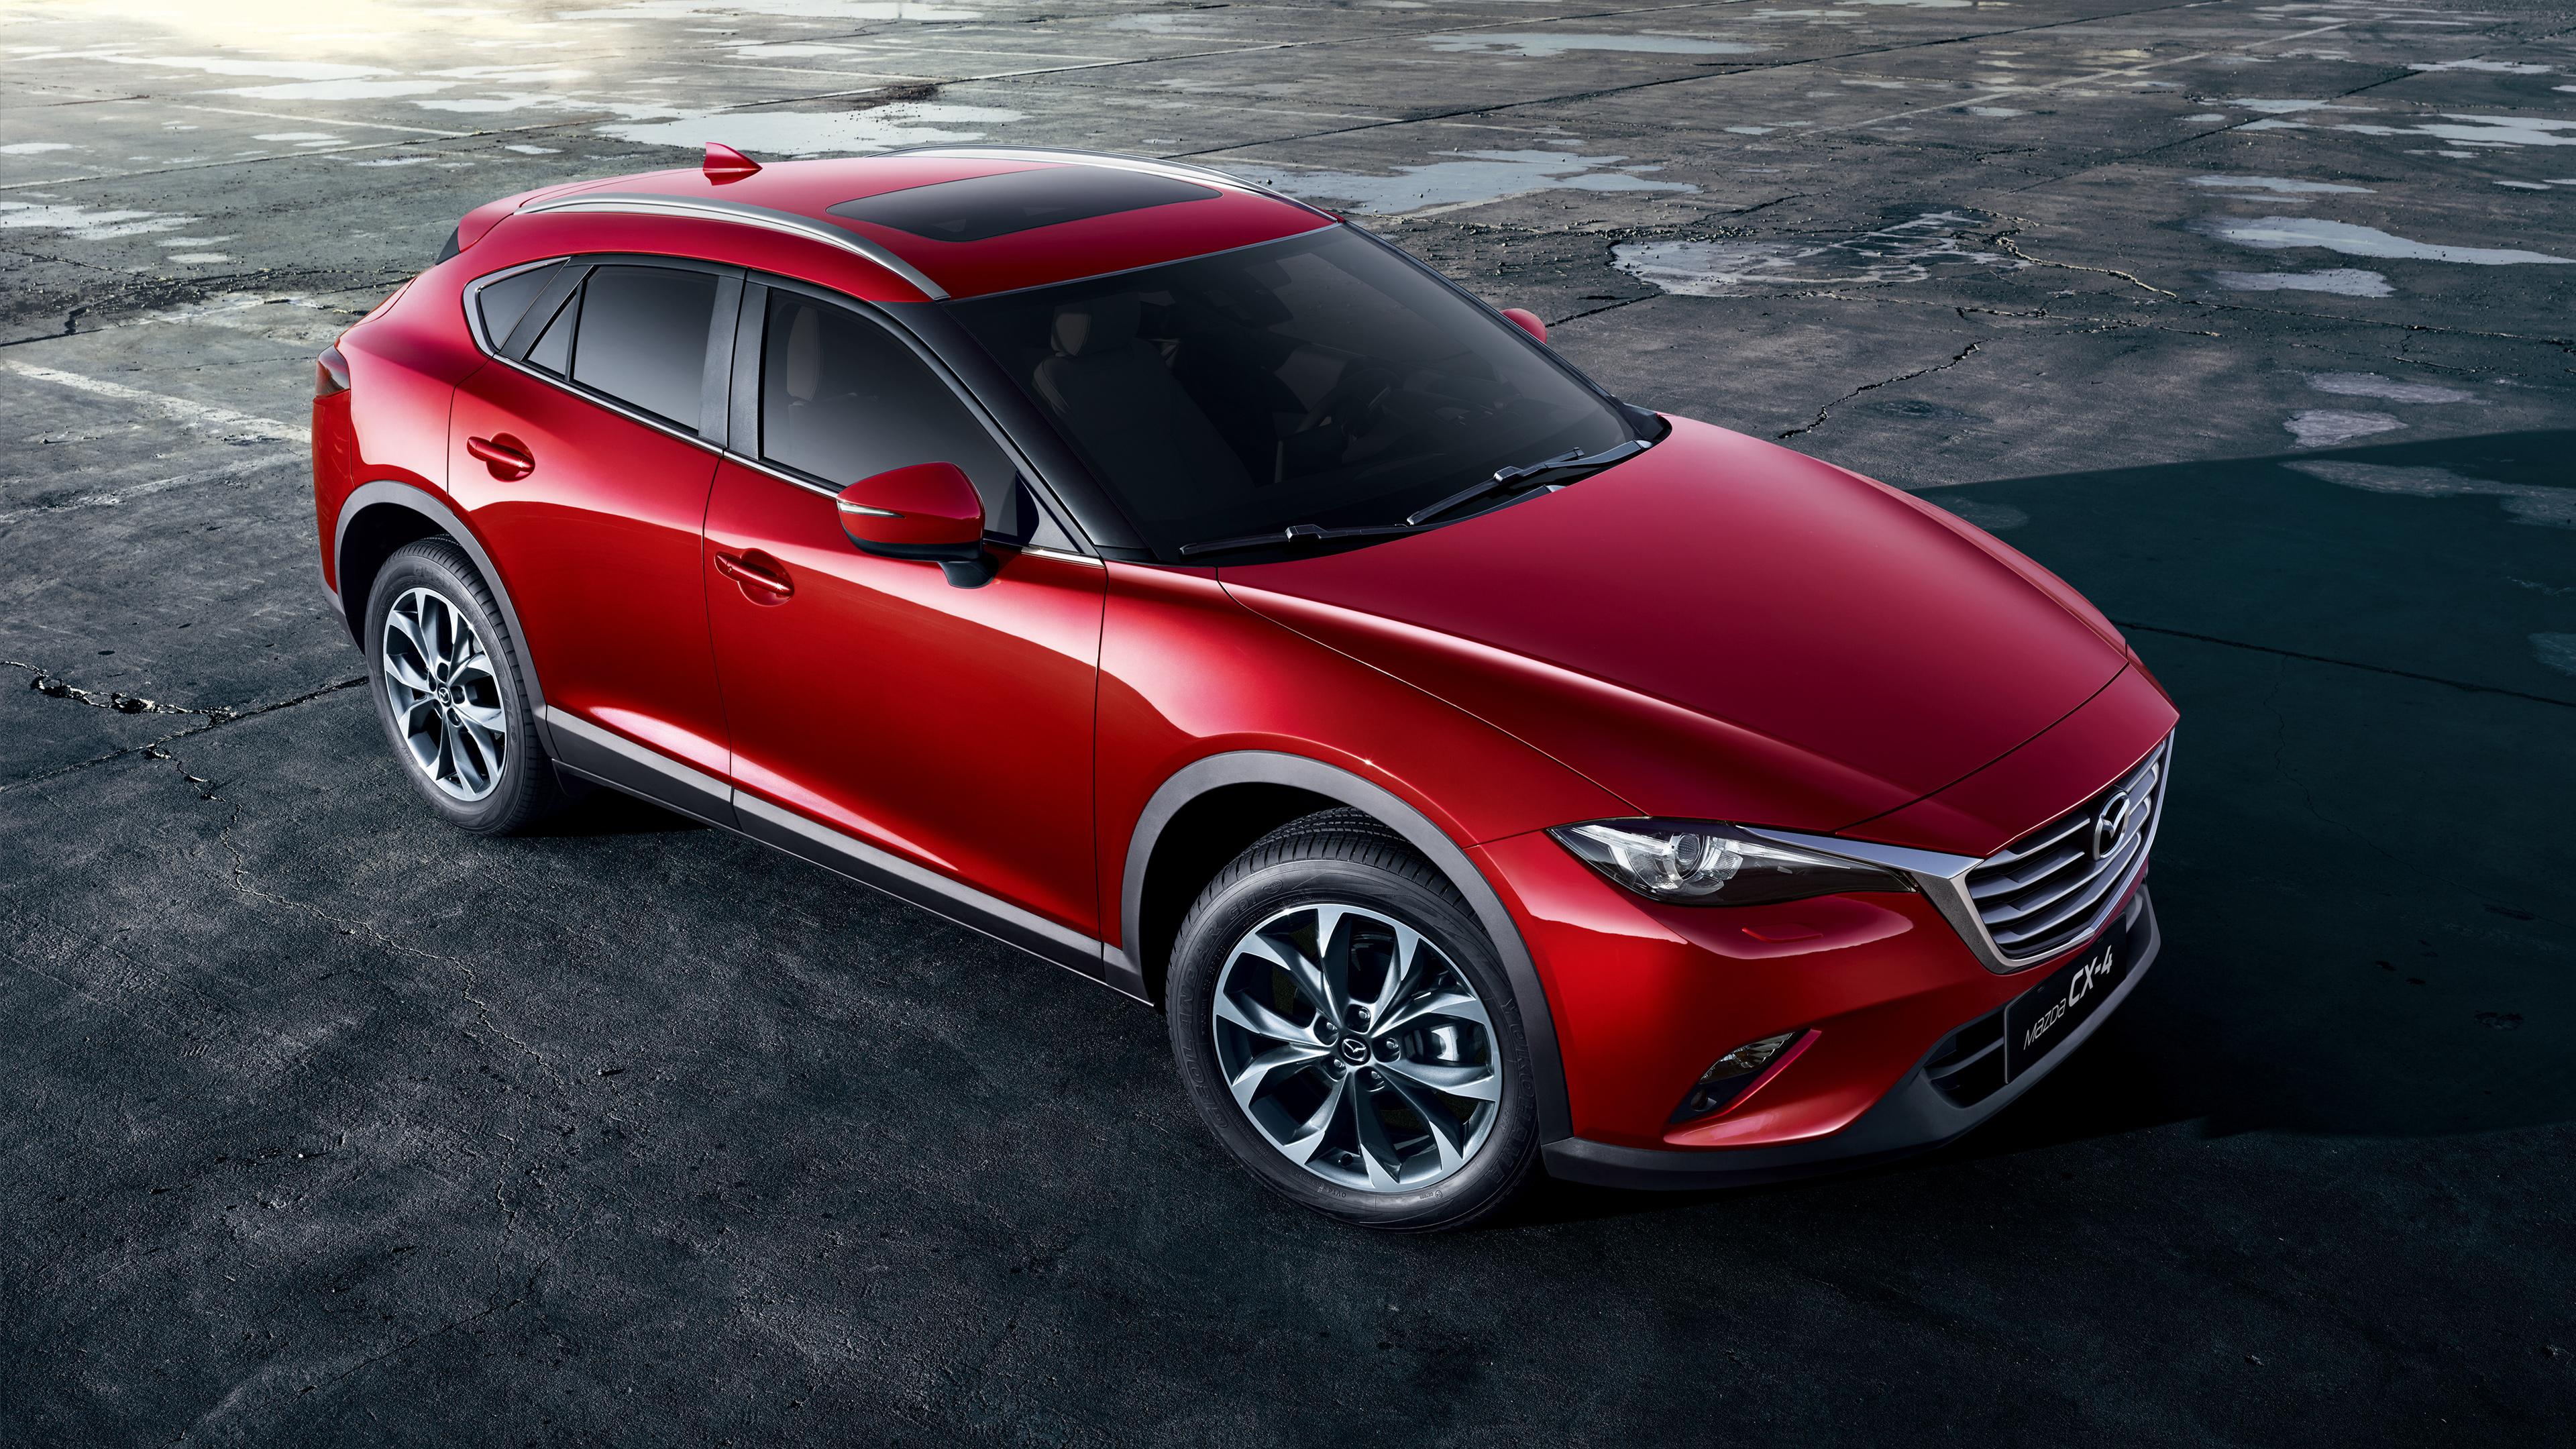 2017 mazda cx 1539104687 - 2017 Mazda Cx - mazda wallpapers, cars wallpapers, 2017 cars wallpapers